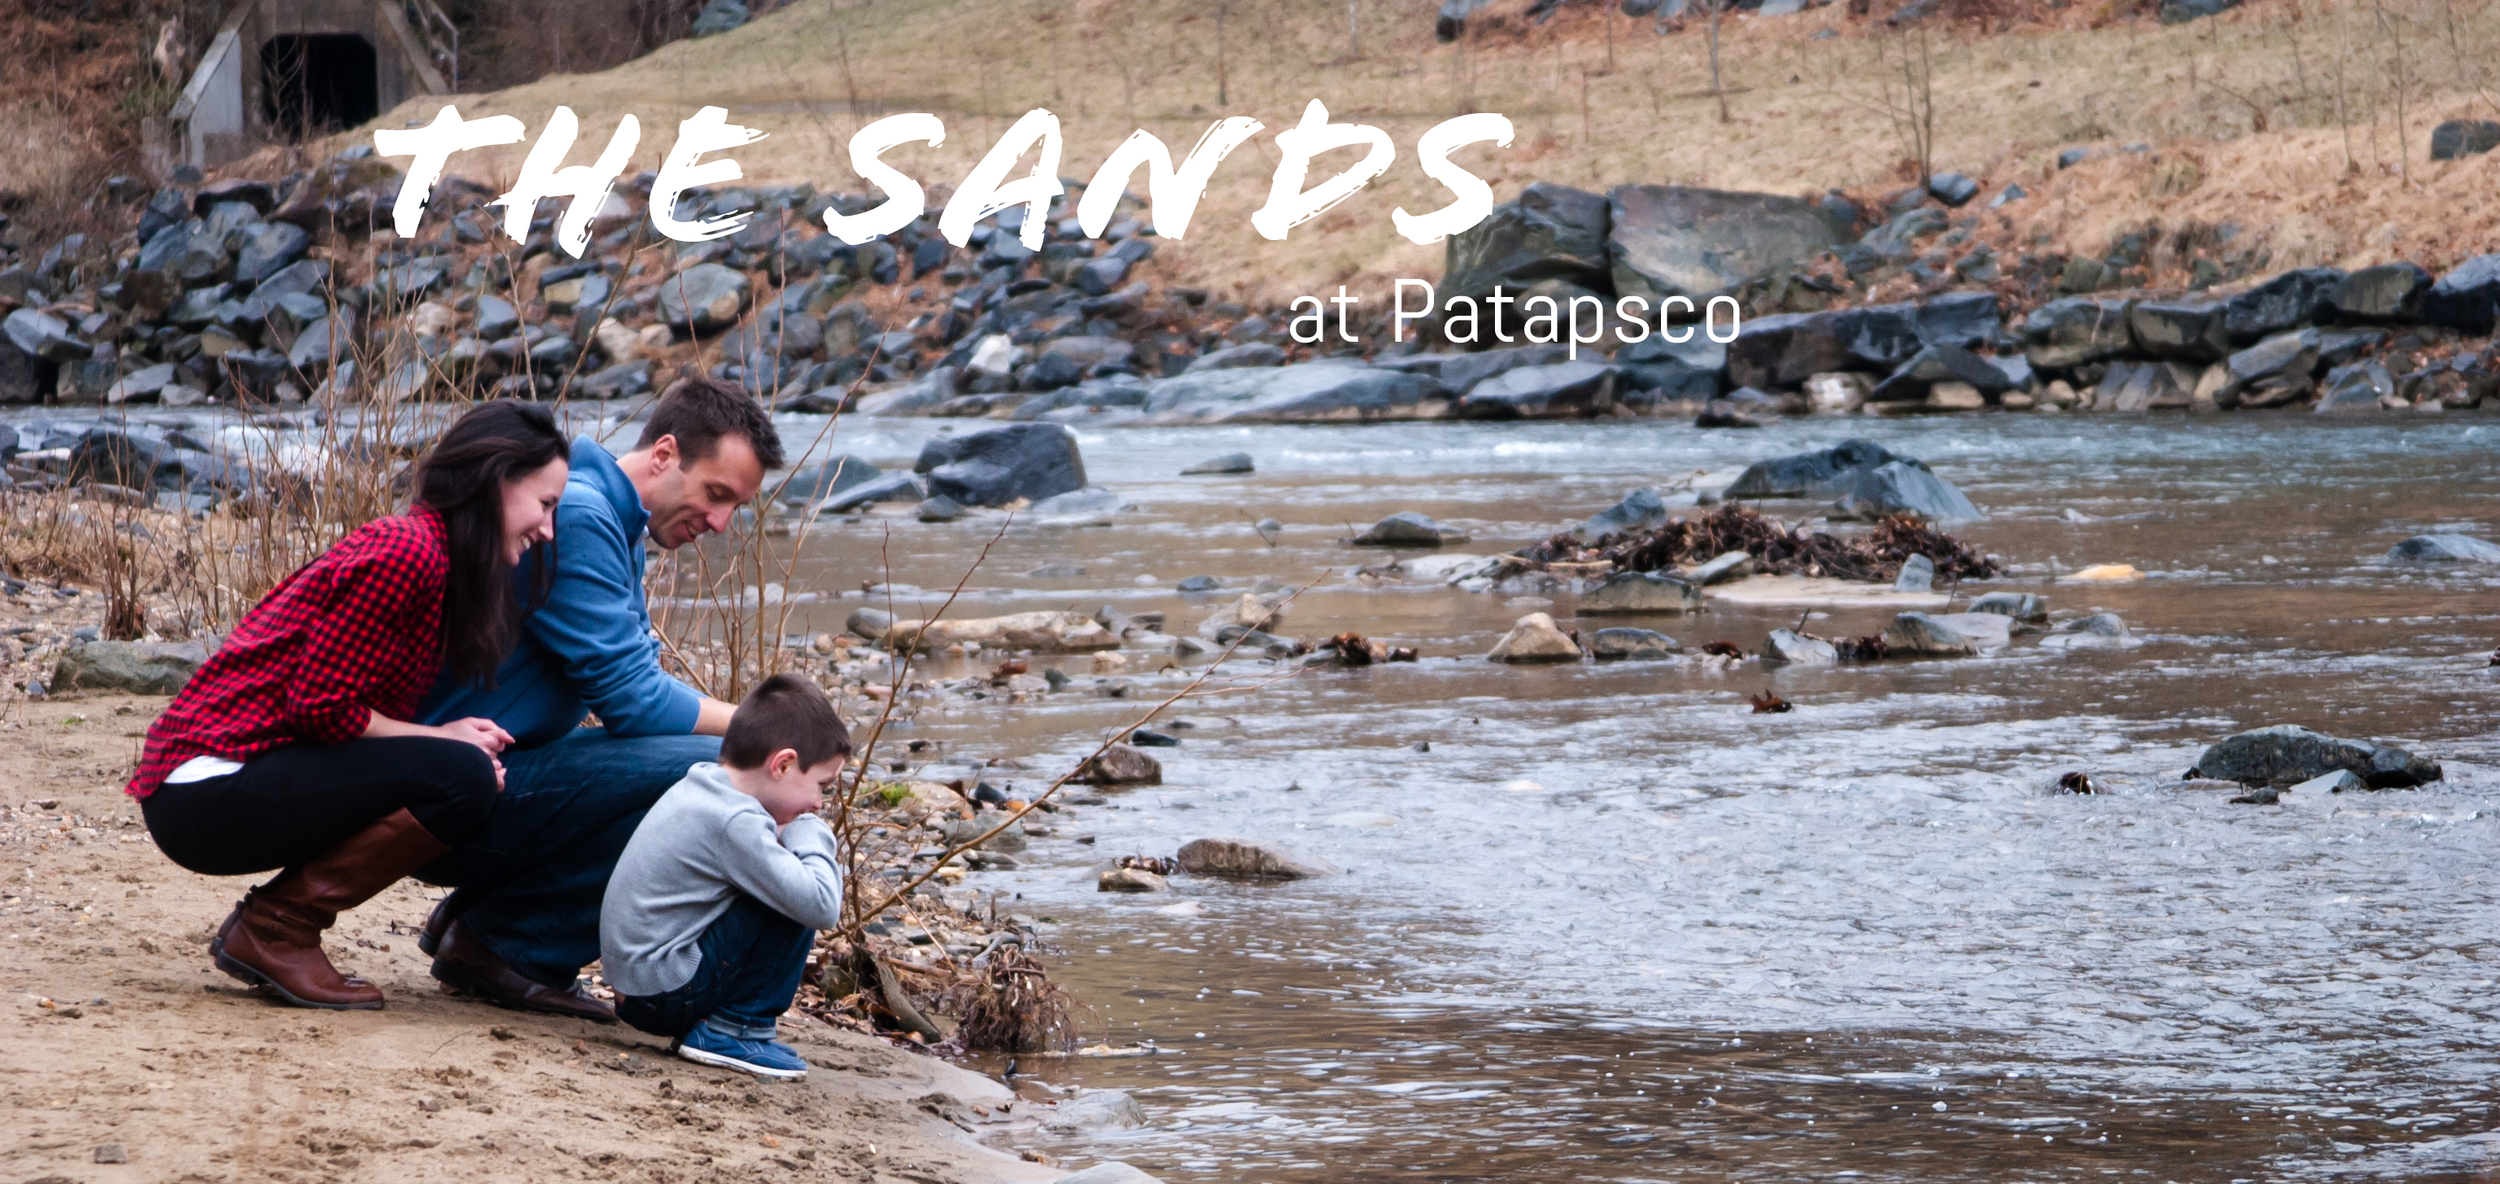 patapsco_river_banner